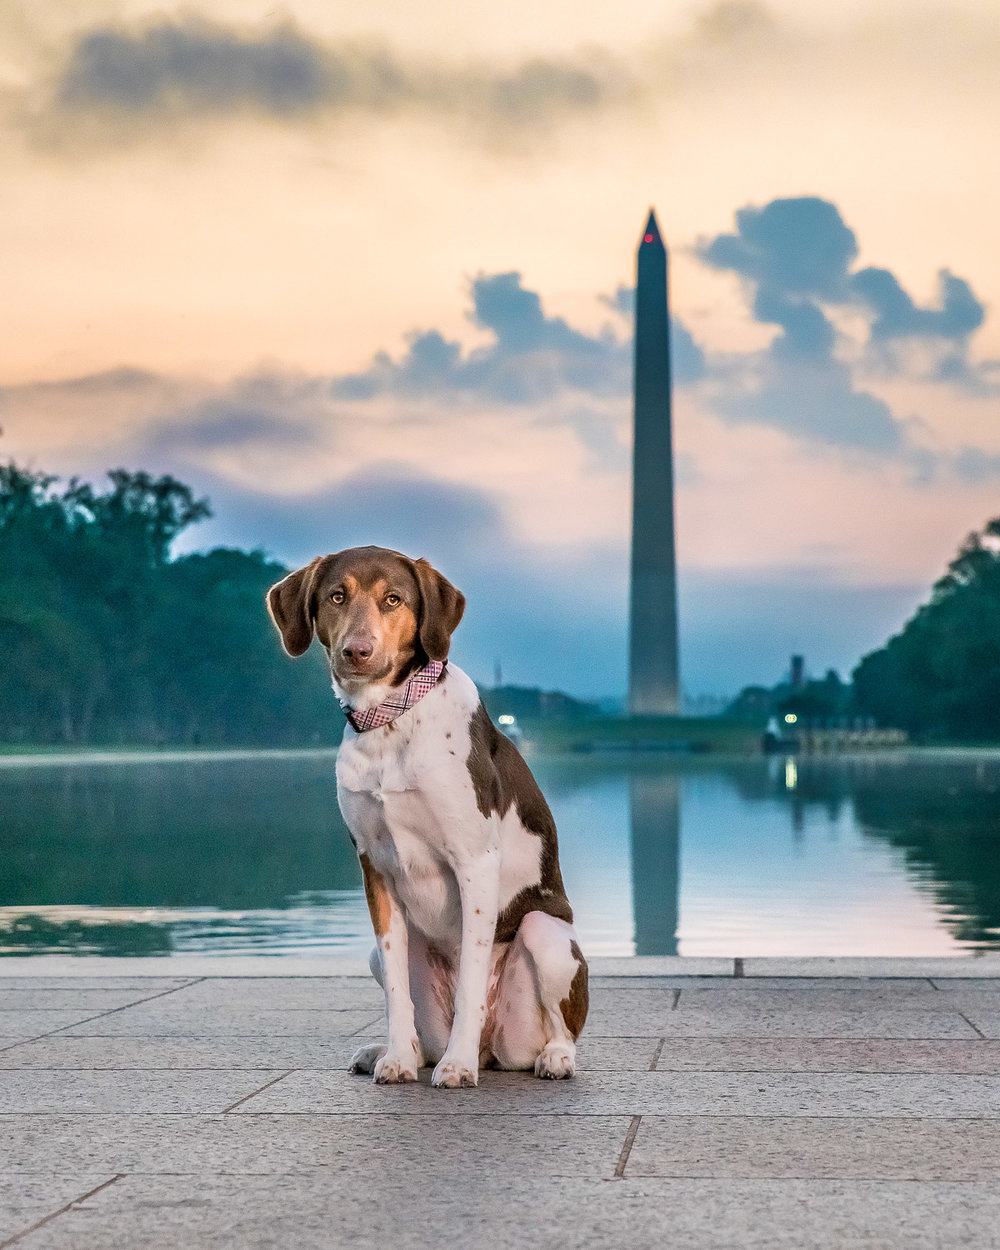 Washington Monument Sunrise in the Background with A Dog Sitting.jpg